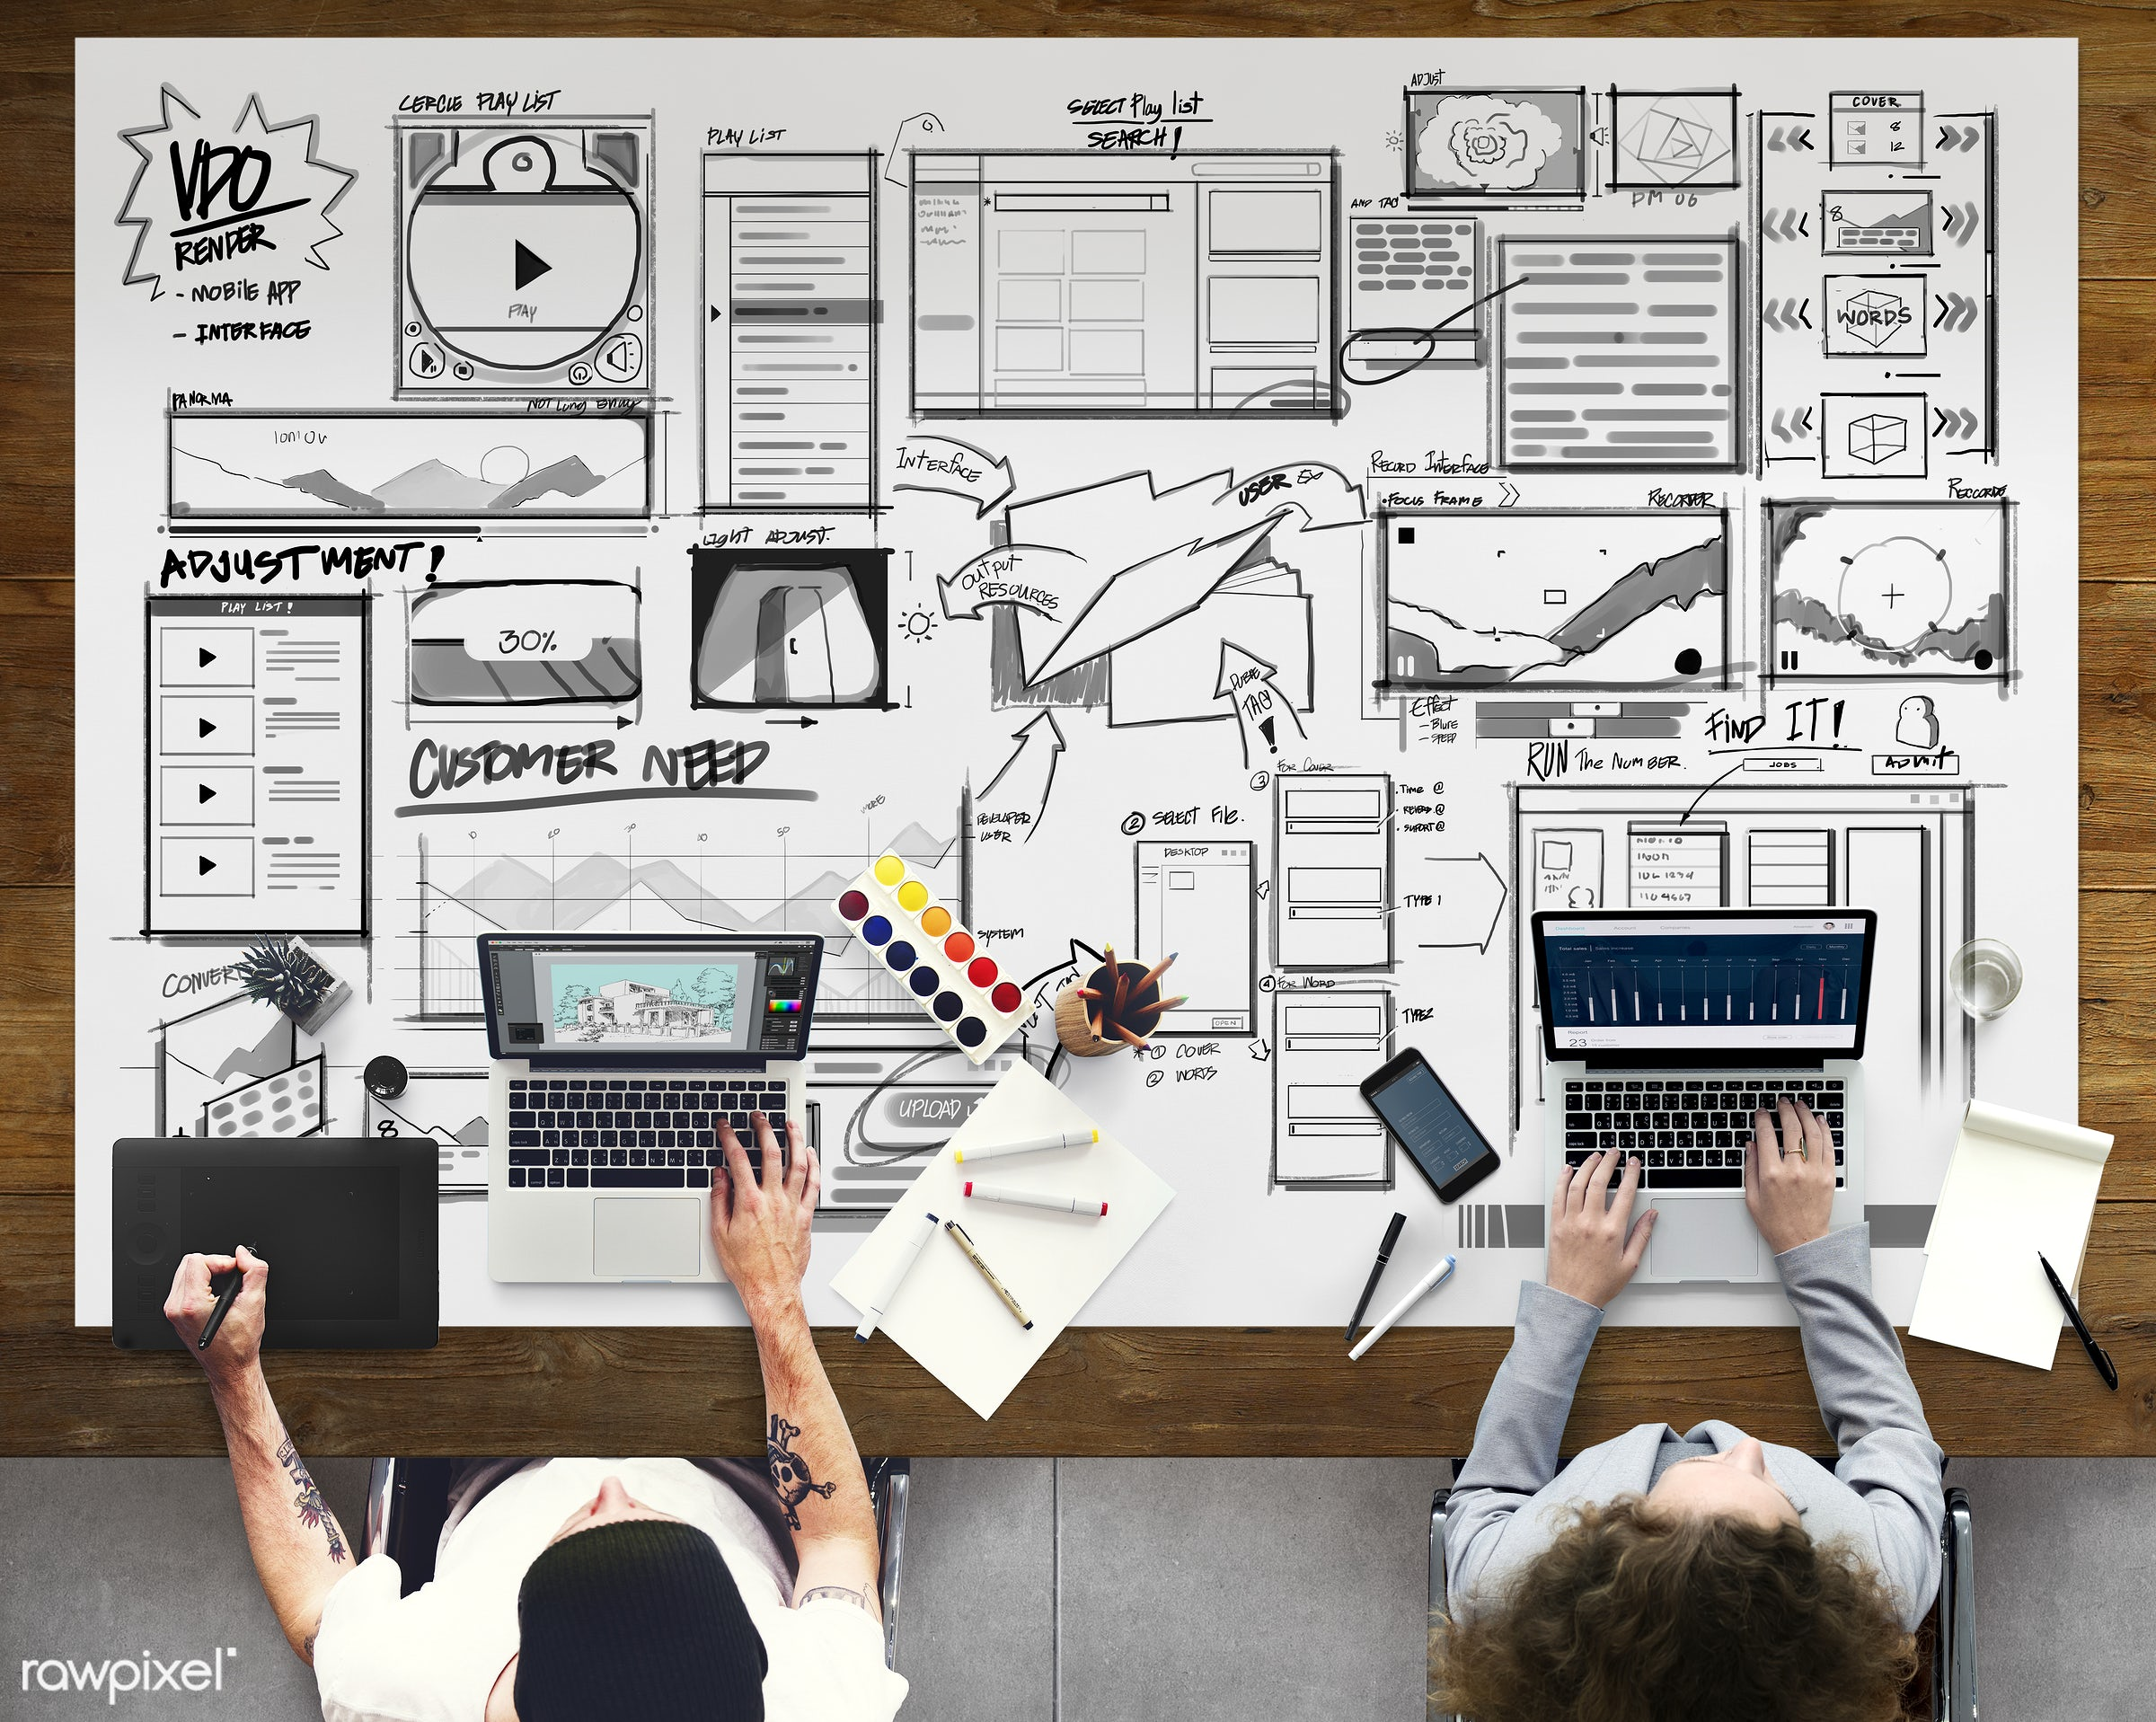 Diverse people are working - ux, pen, aerial, analysis, business, computer, design, designer, device, digital, digital...